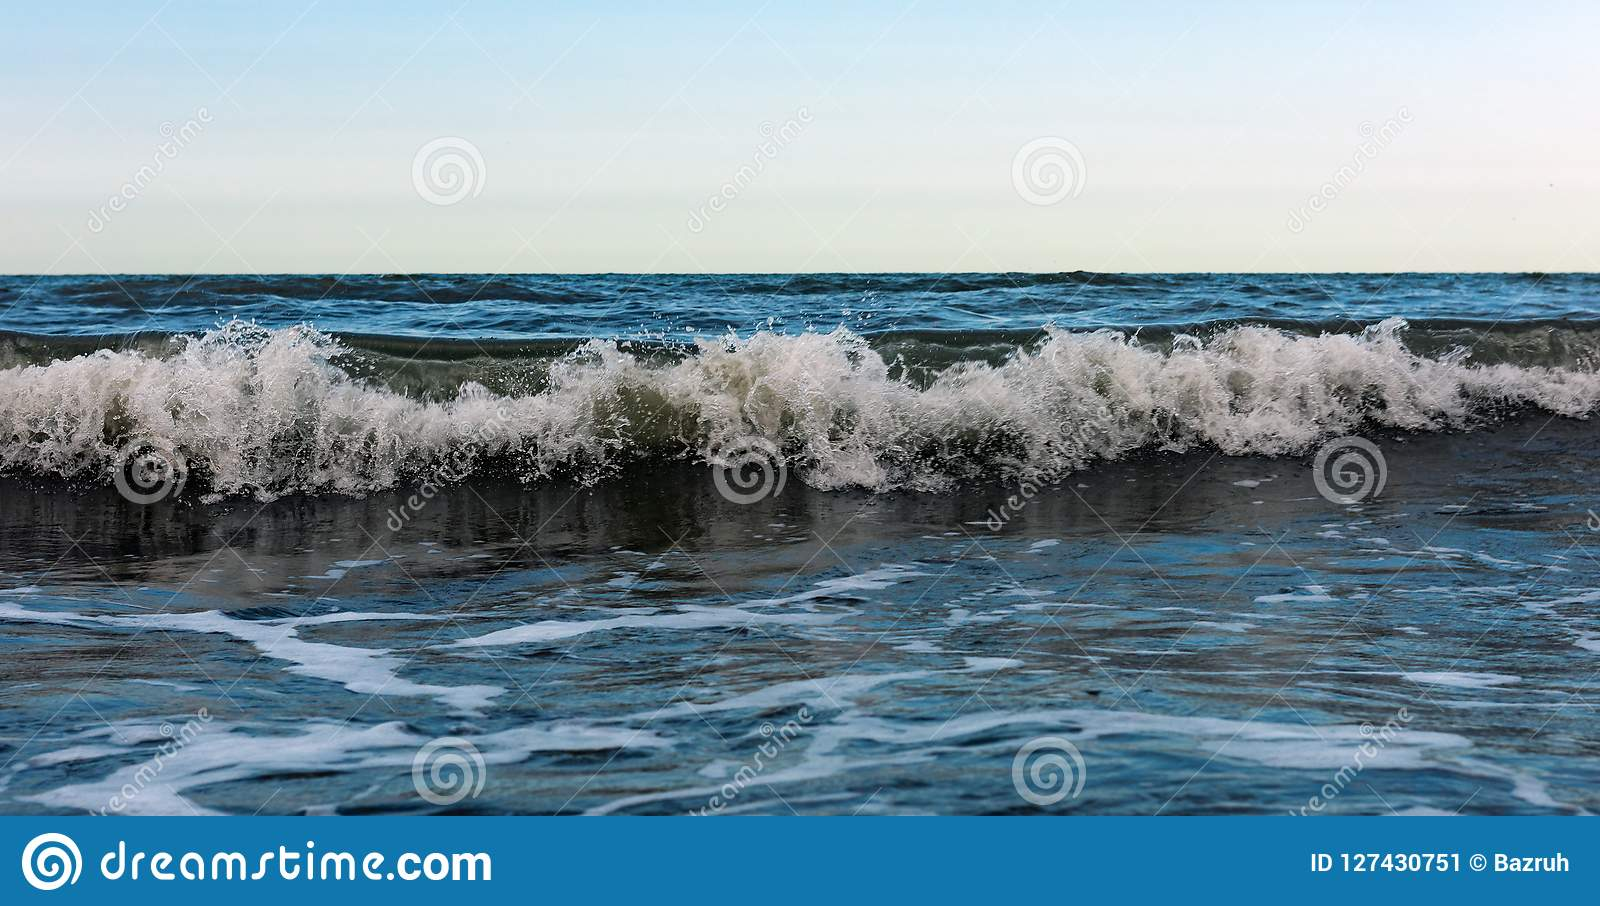 Powerful Sea Waves Splash, Natural Background Stock Image   Image ...